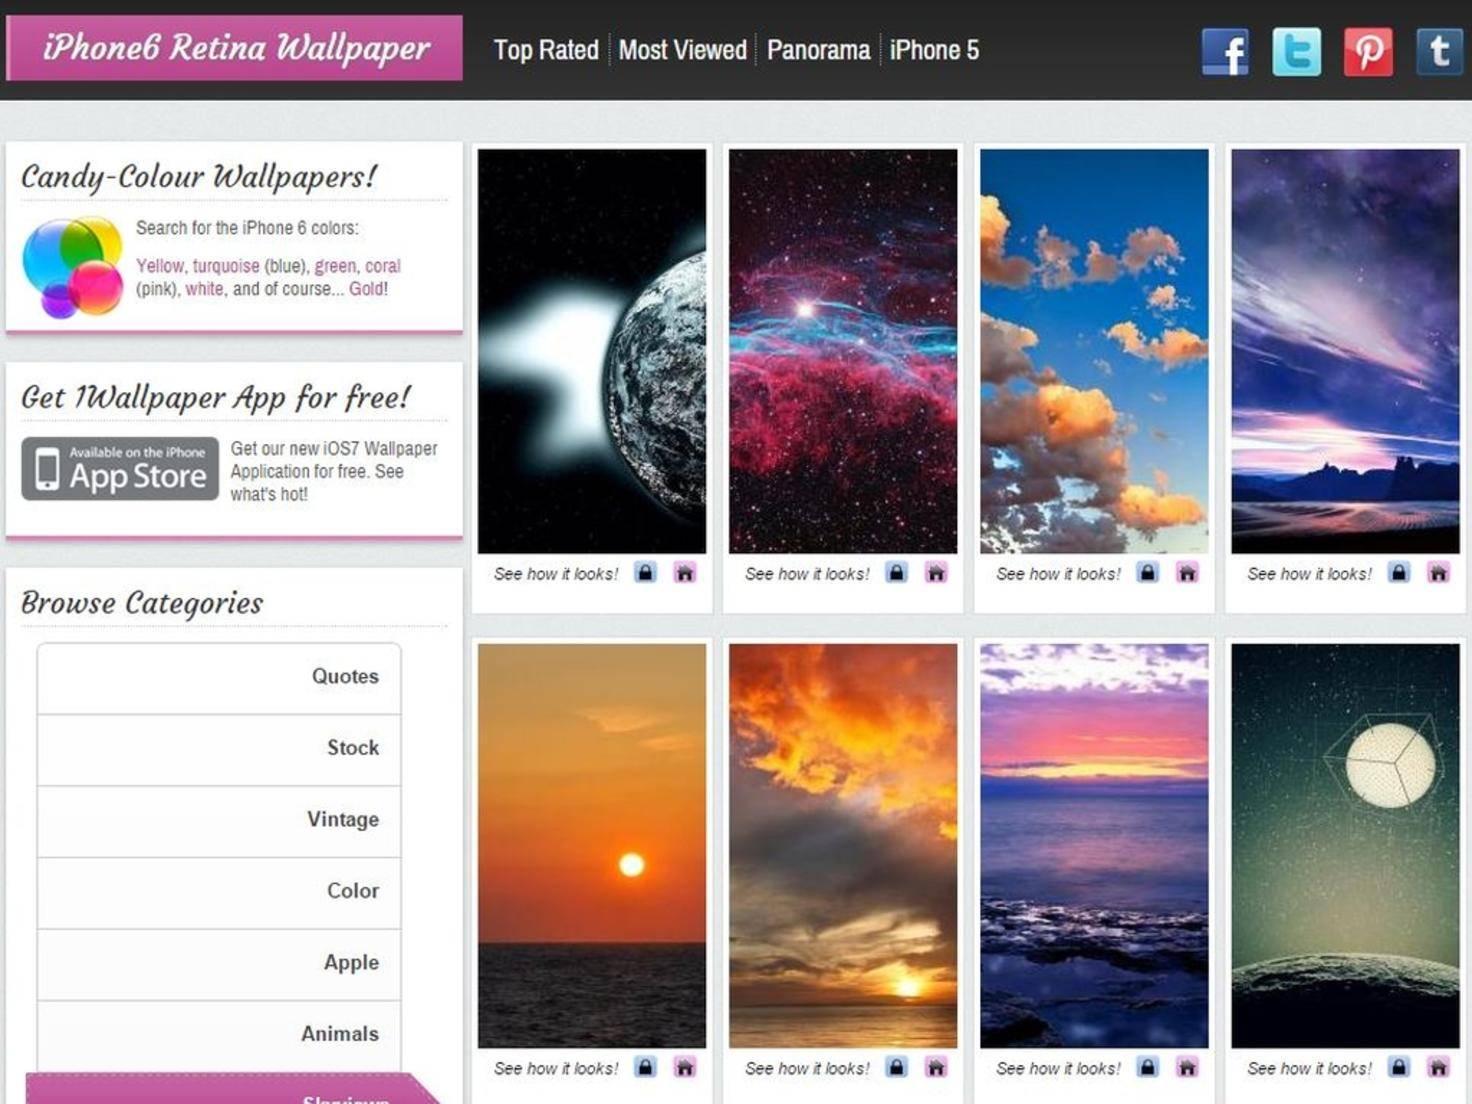 iPhone 6 Retina Wallpaper